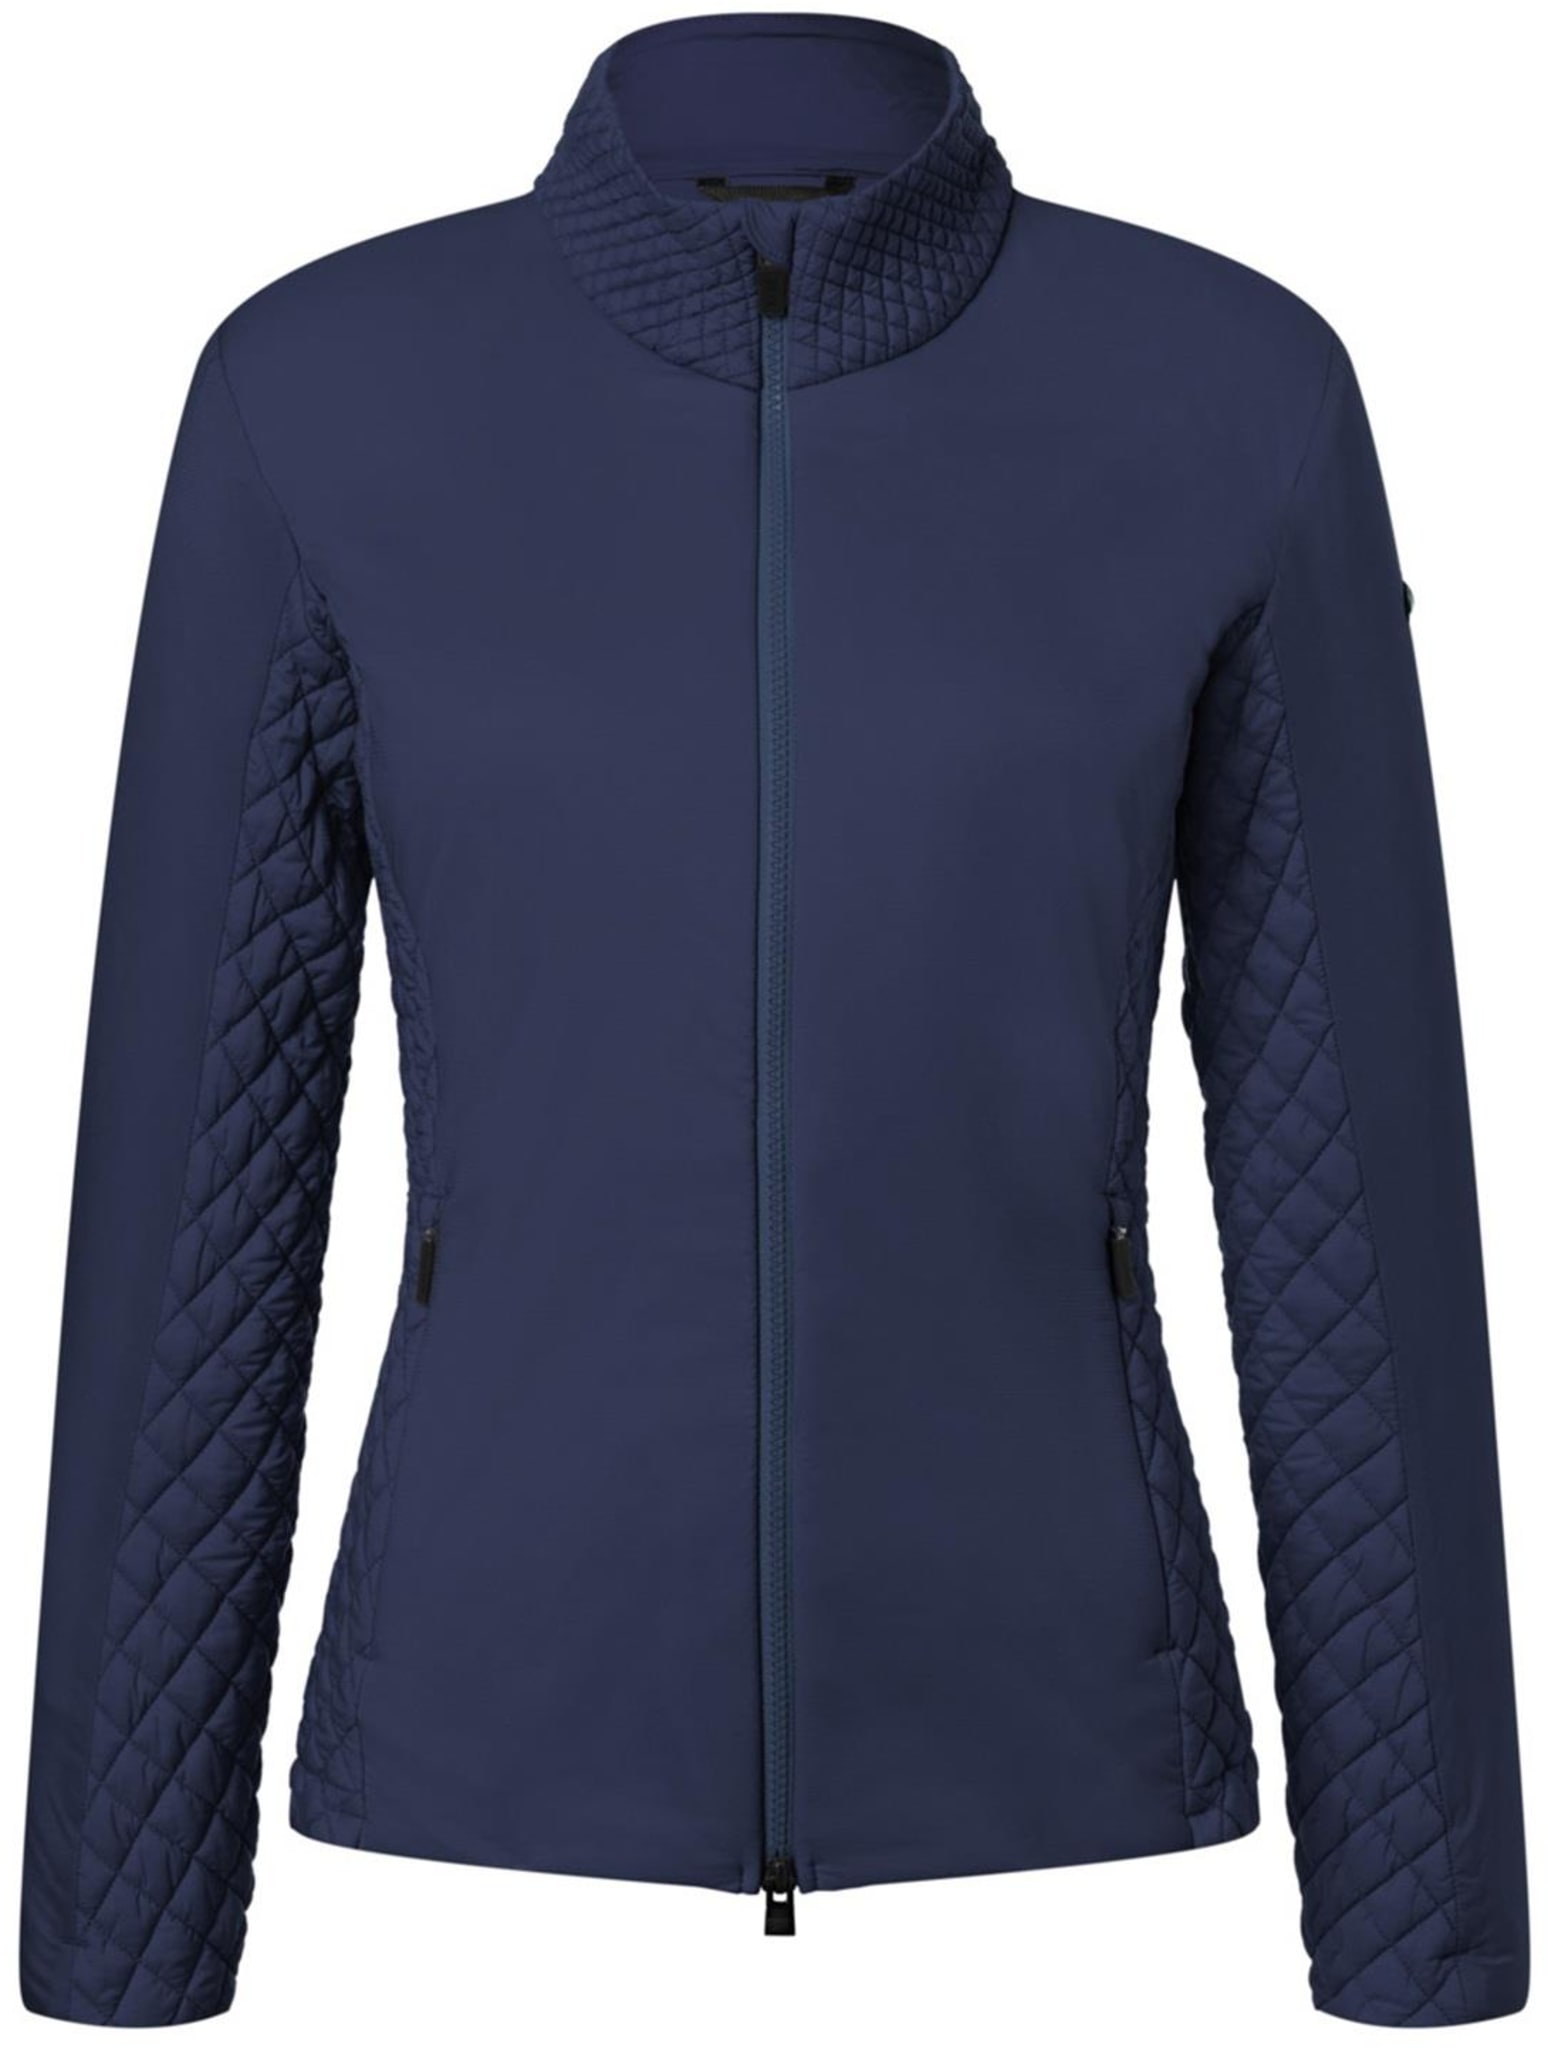 Macuna Insulation Jacket Women